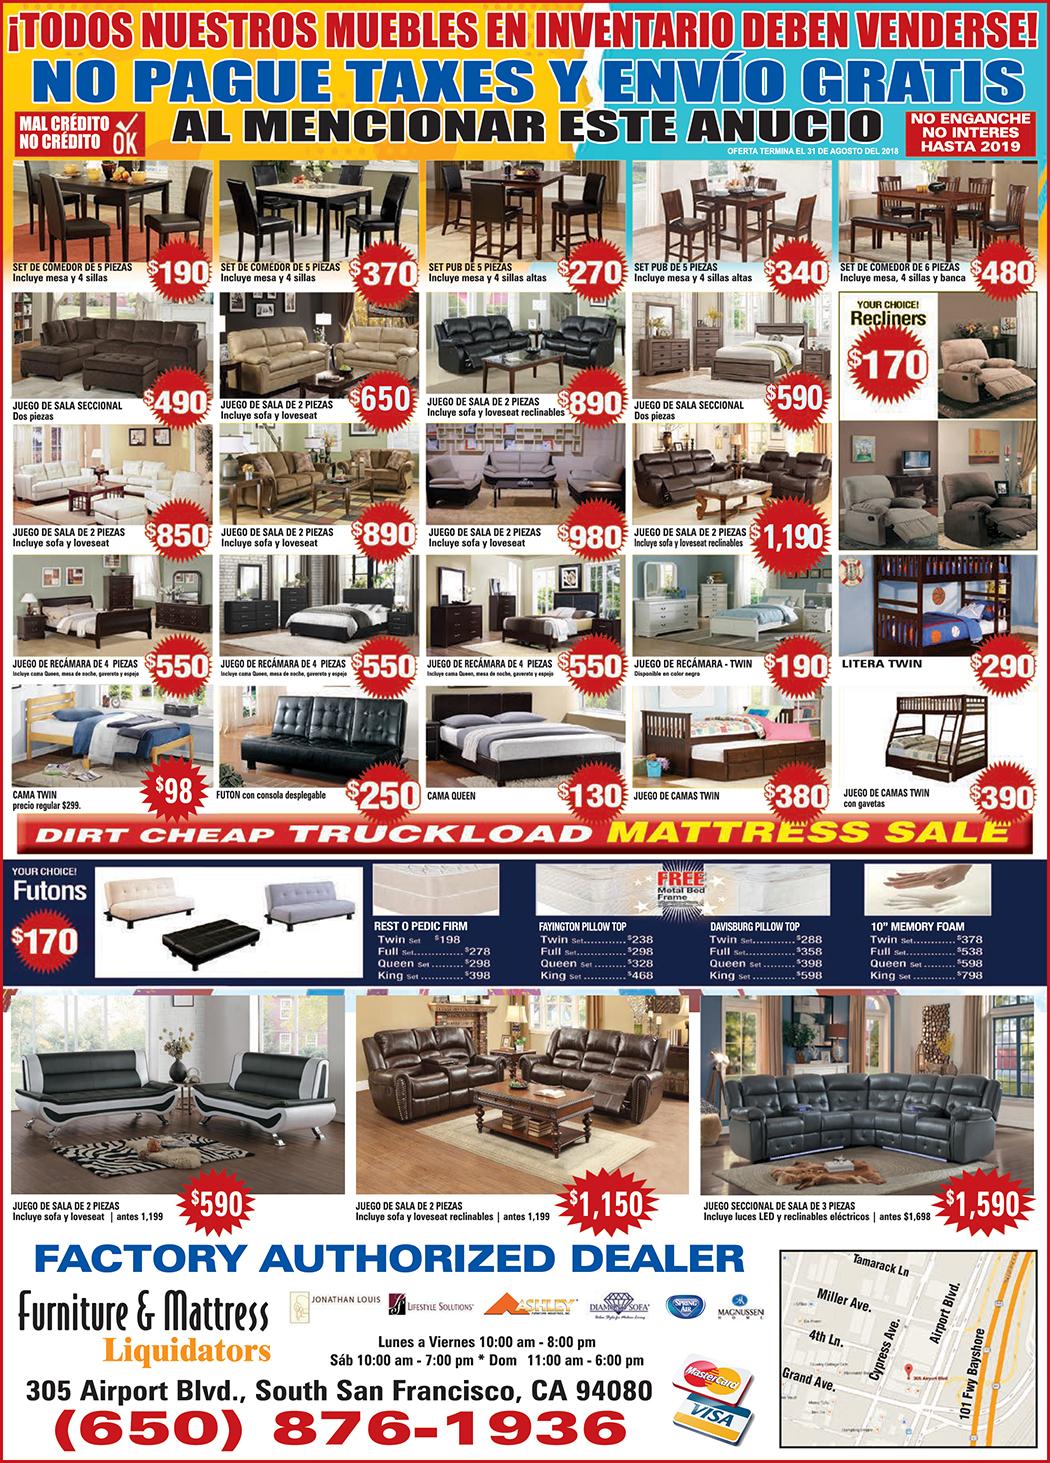 Furniture & Mattress Liquidators 1 Pag  - AGOSTO 2018 copy.jpg